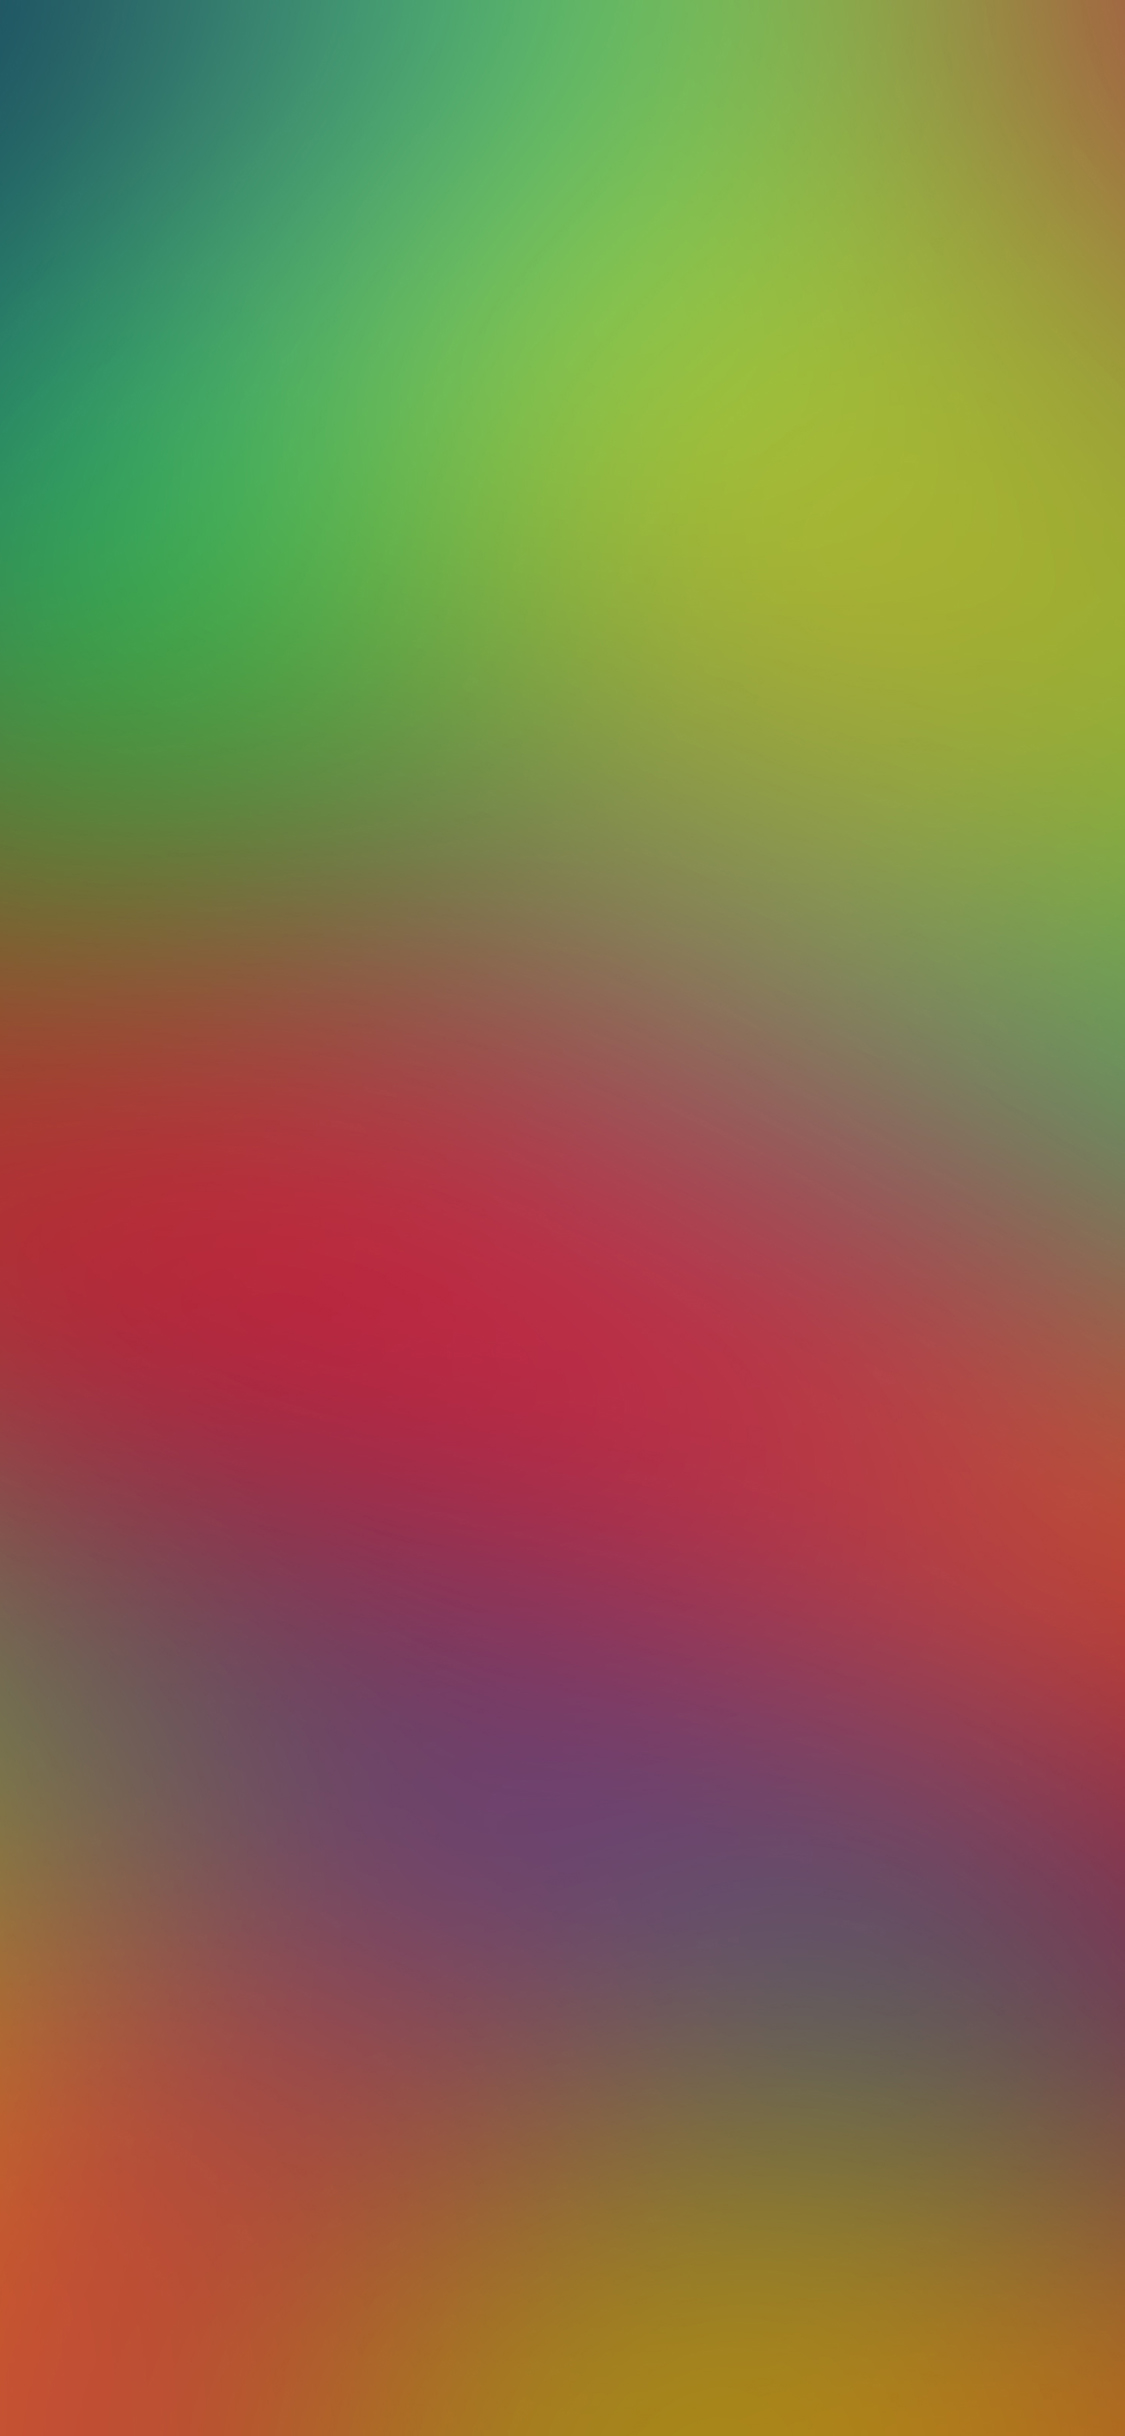 iPhoneXpapers.com-Apple-iPhone-wallpaper-sb48-wallpaper-galaxy-note-4-paint-pattern-art-blur